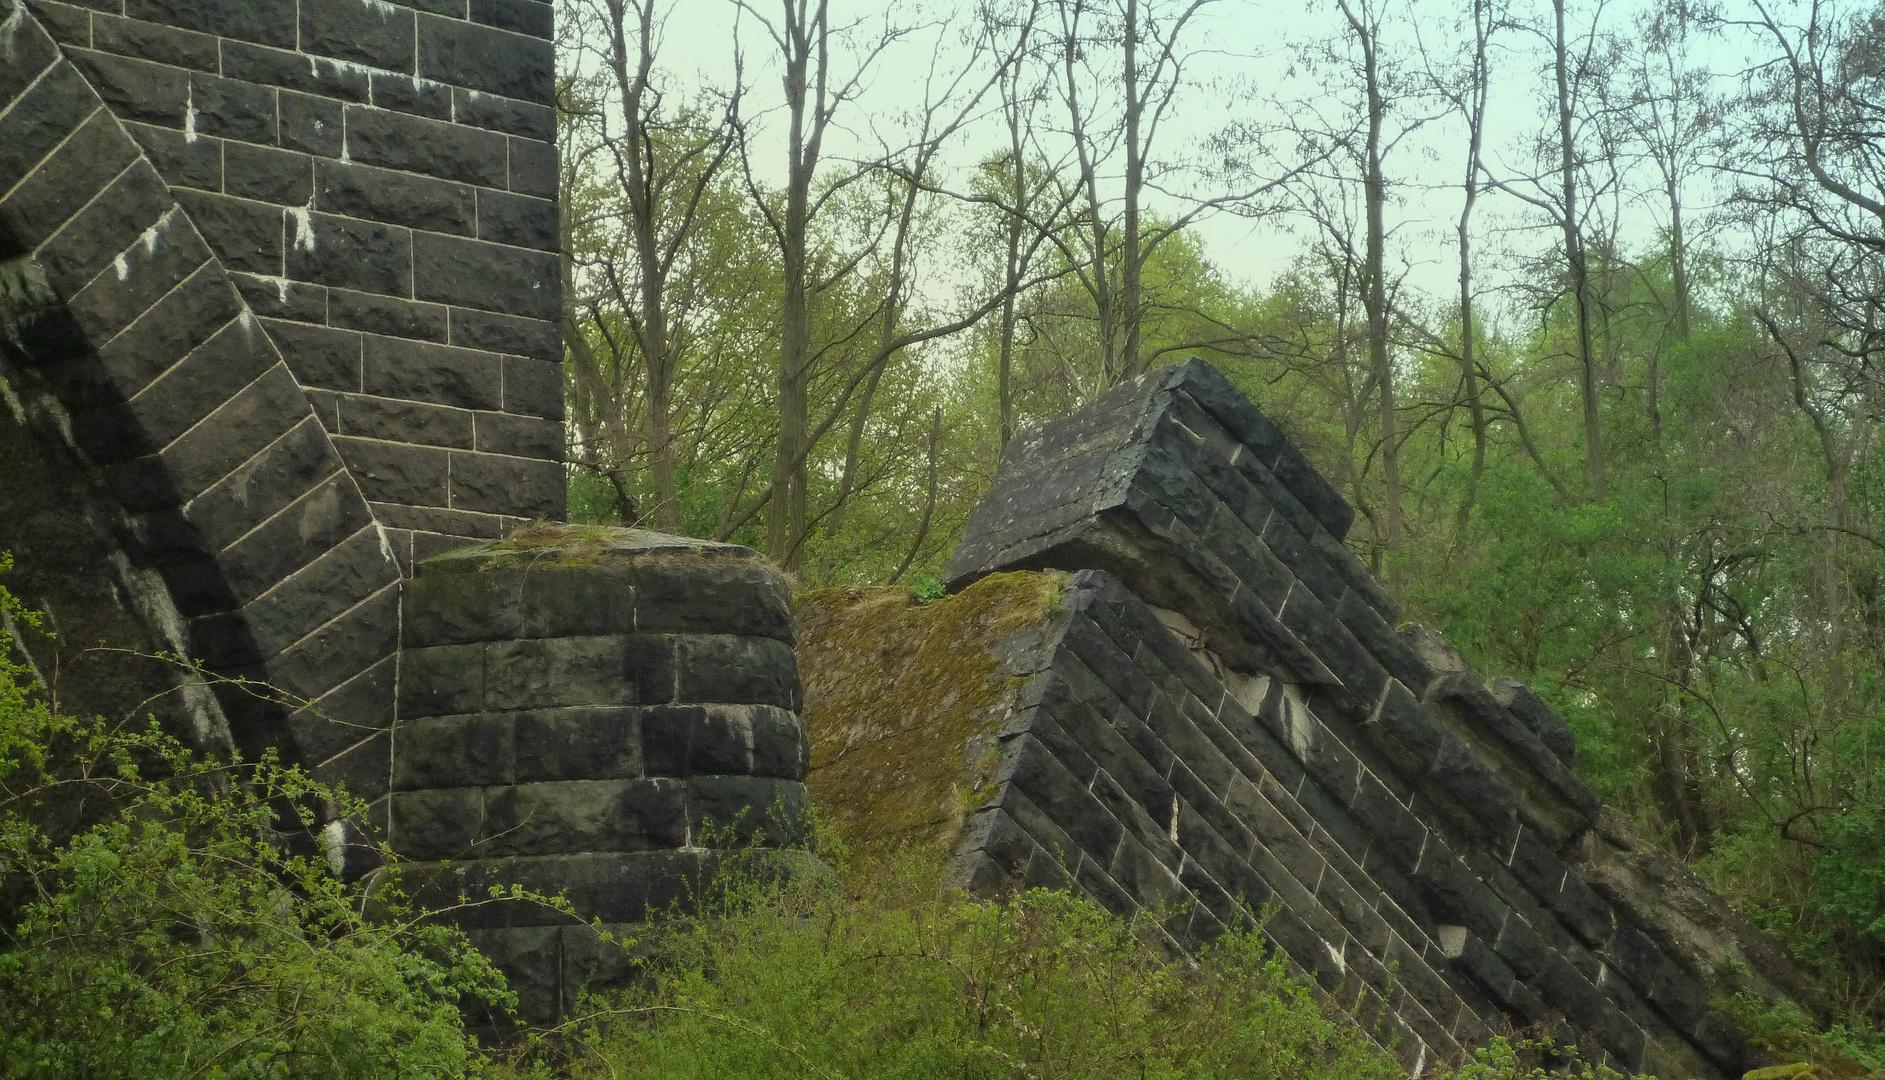 Gesprengt 1945 - Verwunschenes Trümmerfeld heute (2)